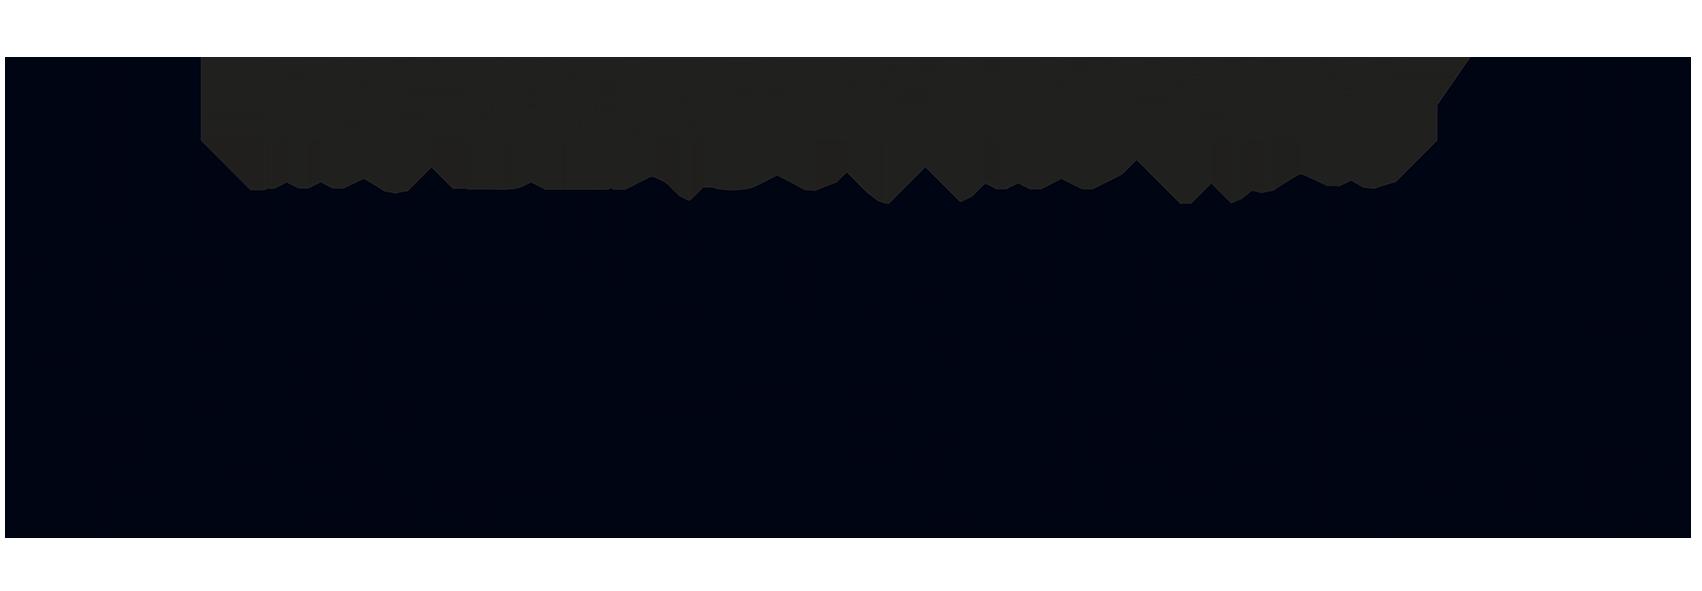 Logo My Beauty my way black